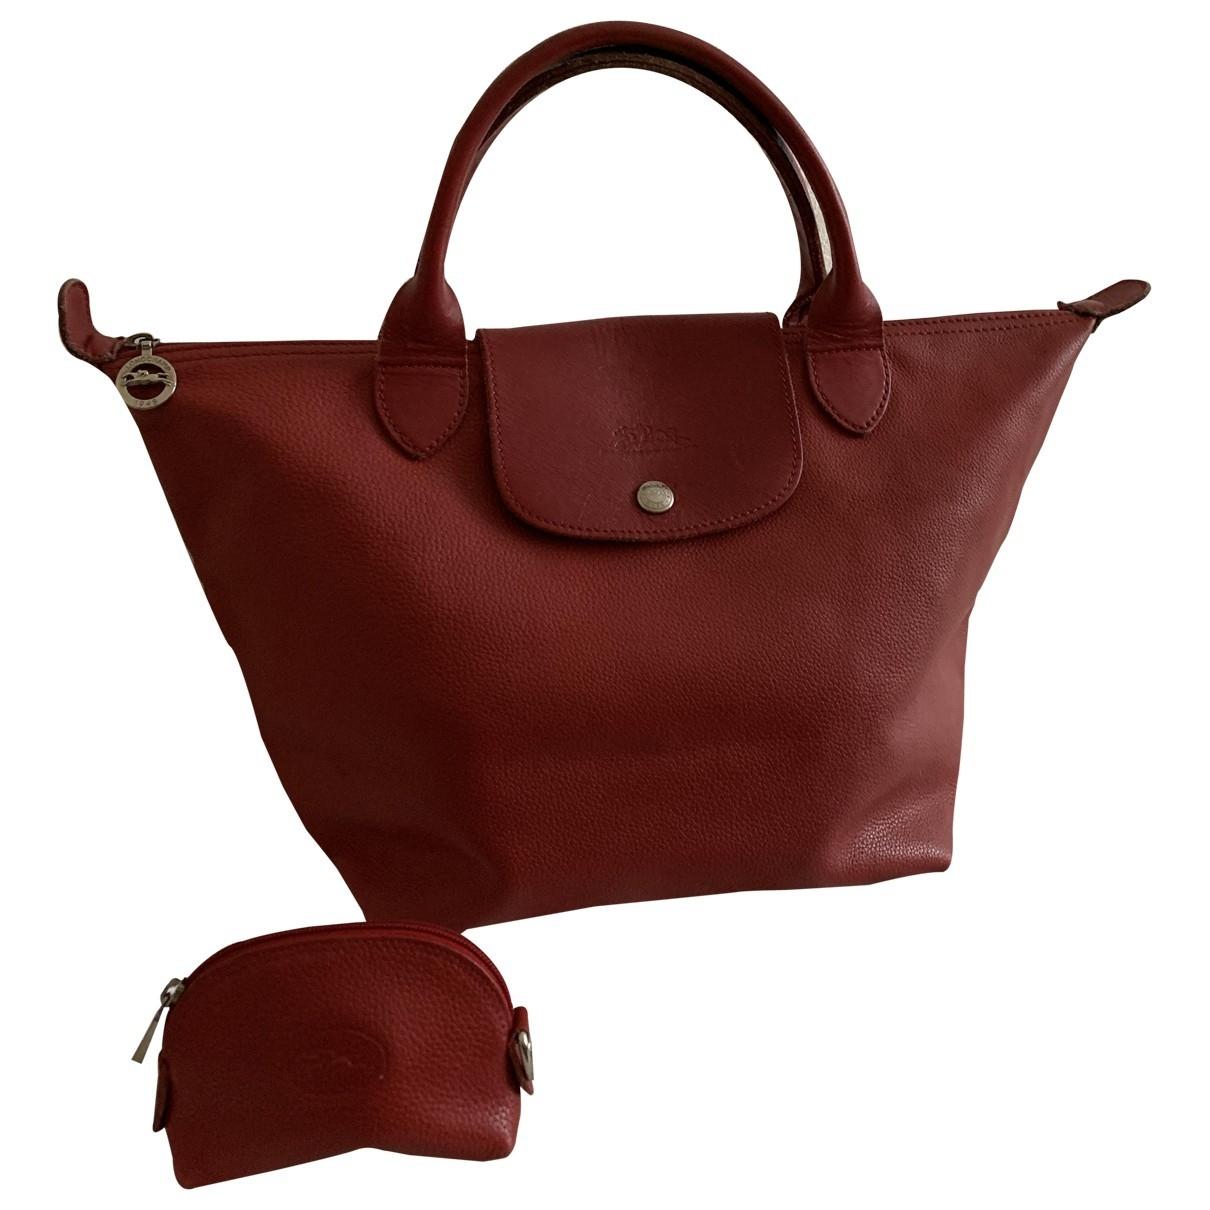 Bolso  Pliage  de Cuero Longchamp